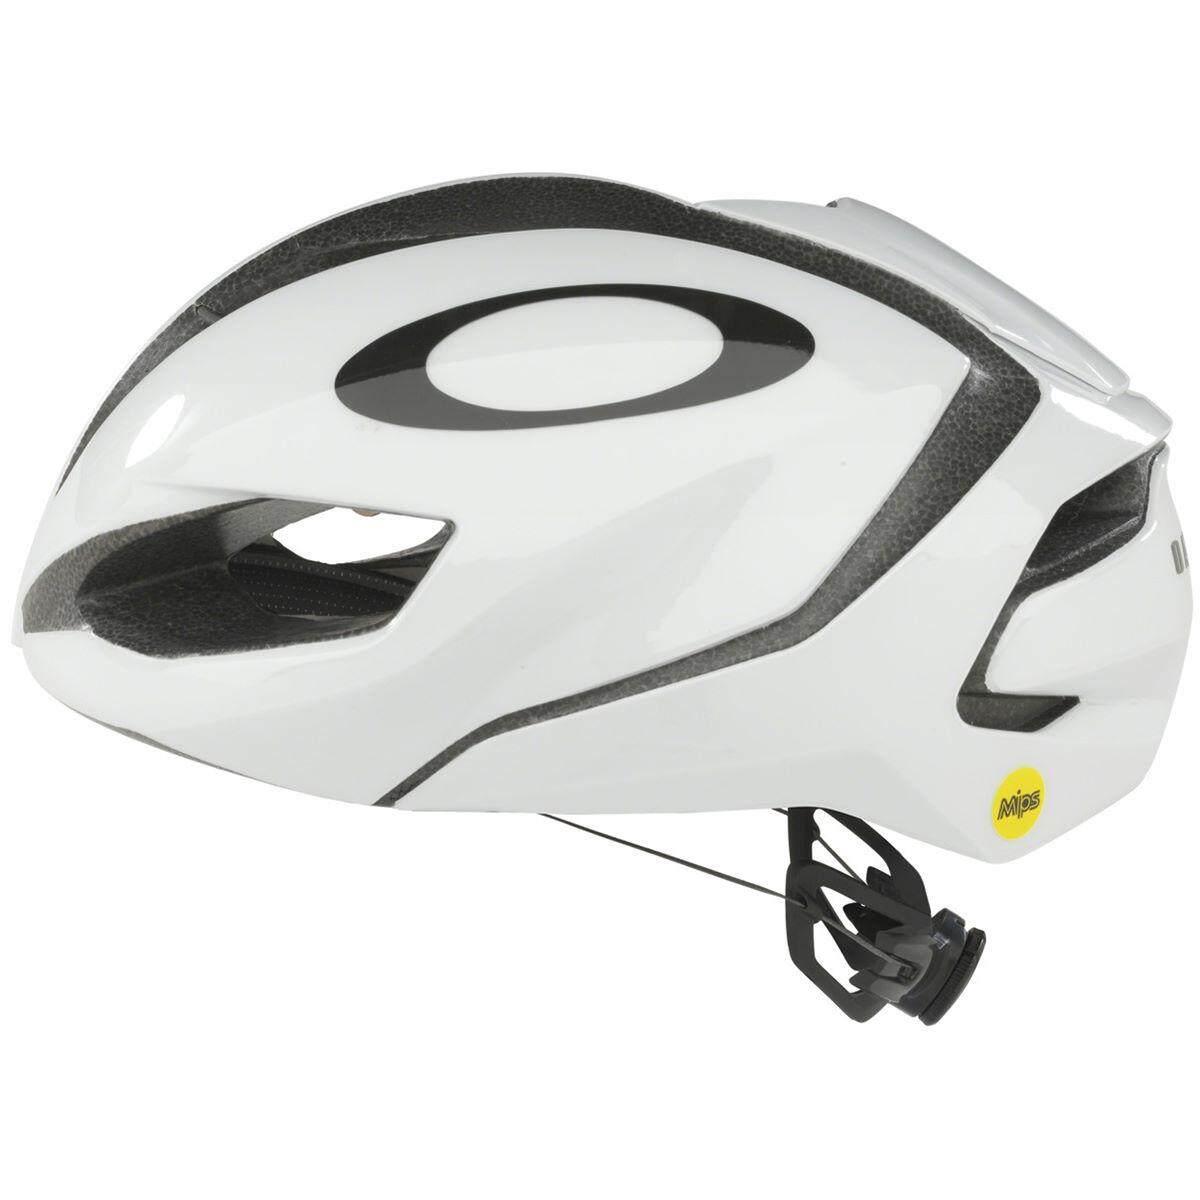 Oakley Buy At Best Price In Malaysia Kacamata Oem Gb001 Black Aro 5 Helmet White